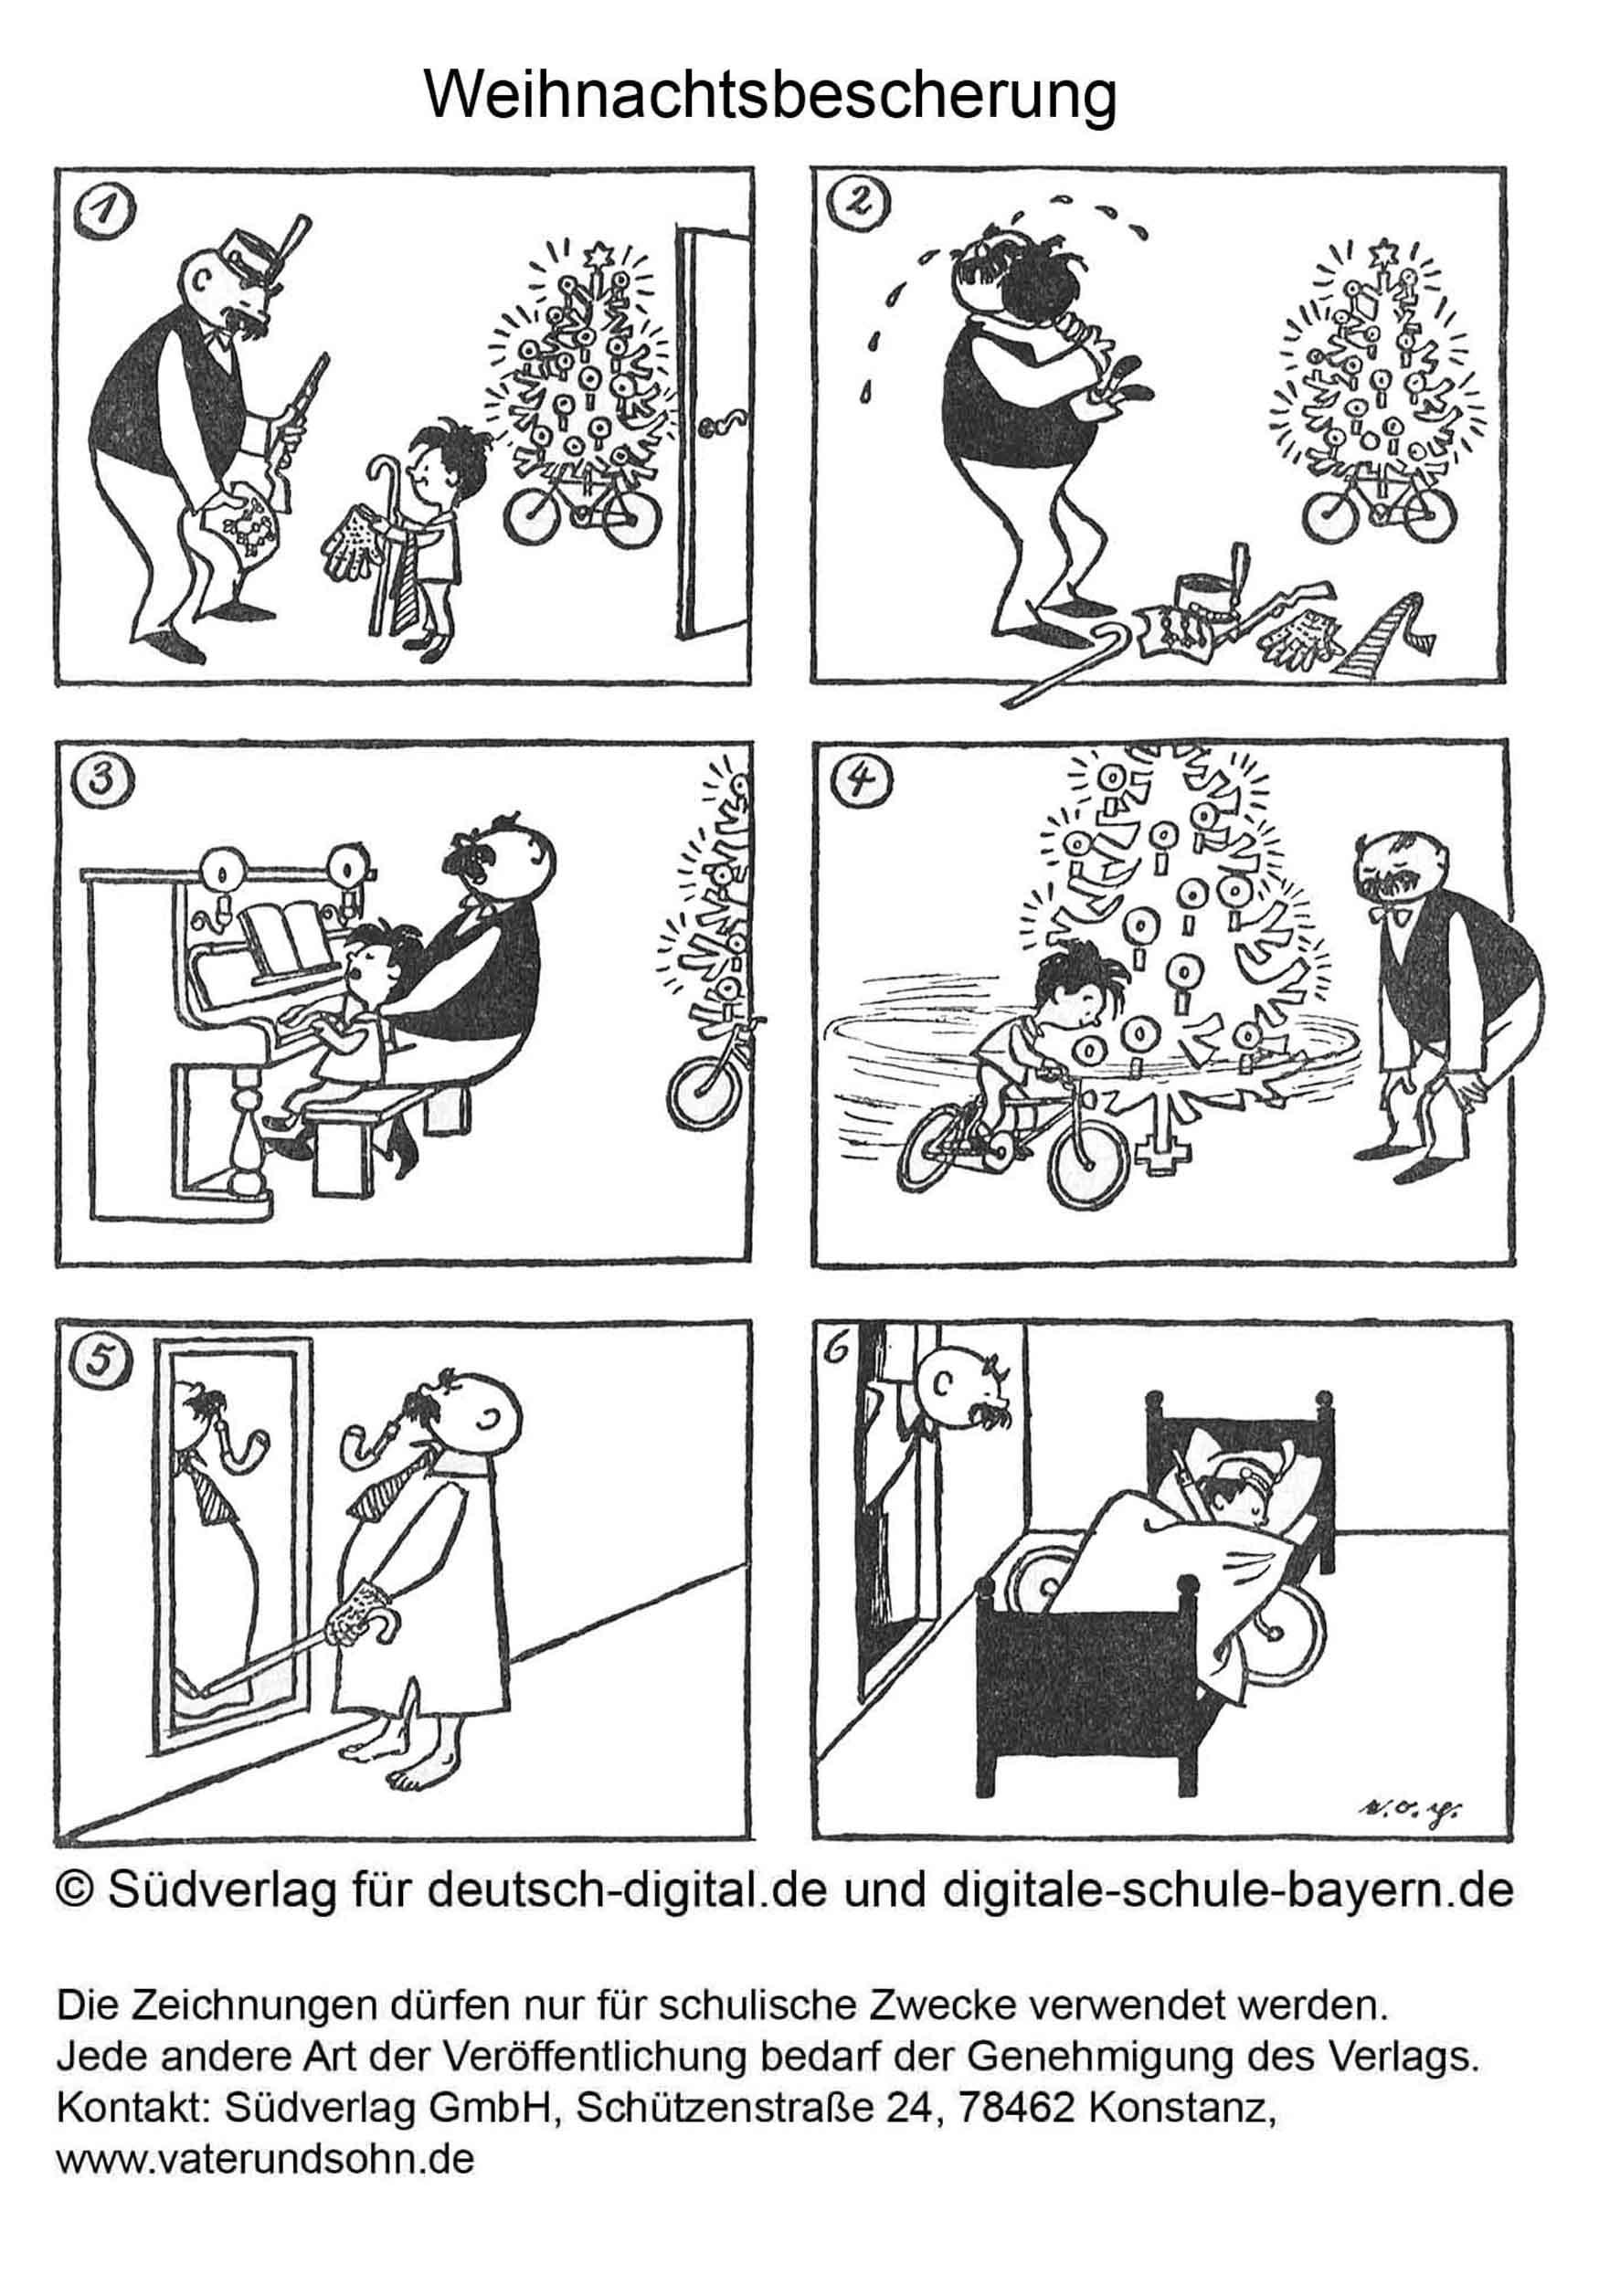 Digitale Schule Bayern - Portal ganzes Beispiele Bildergeschichten 4 Klasse Volksschule